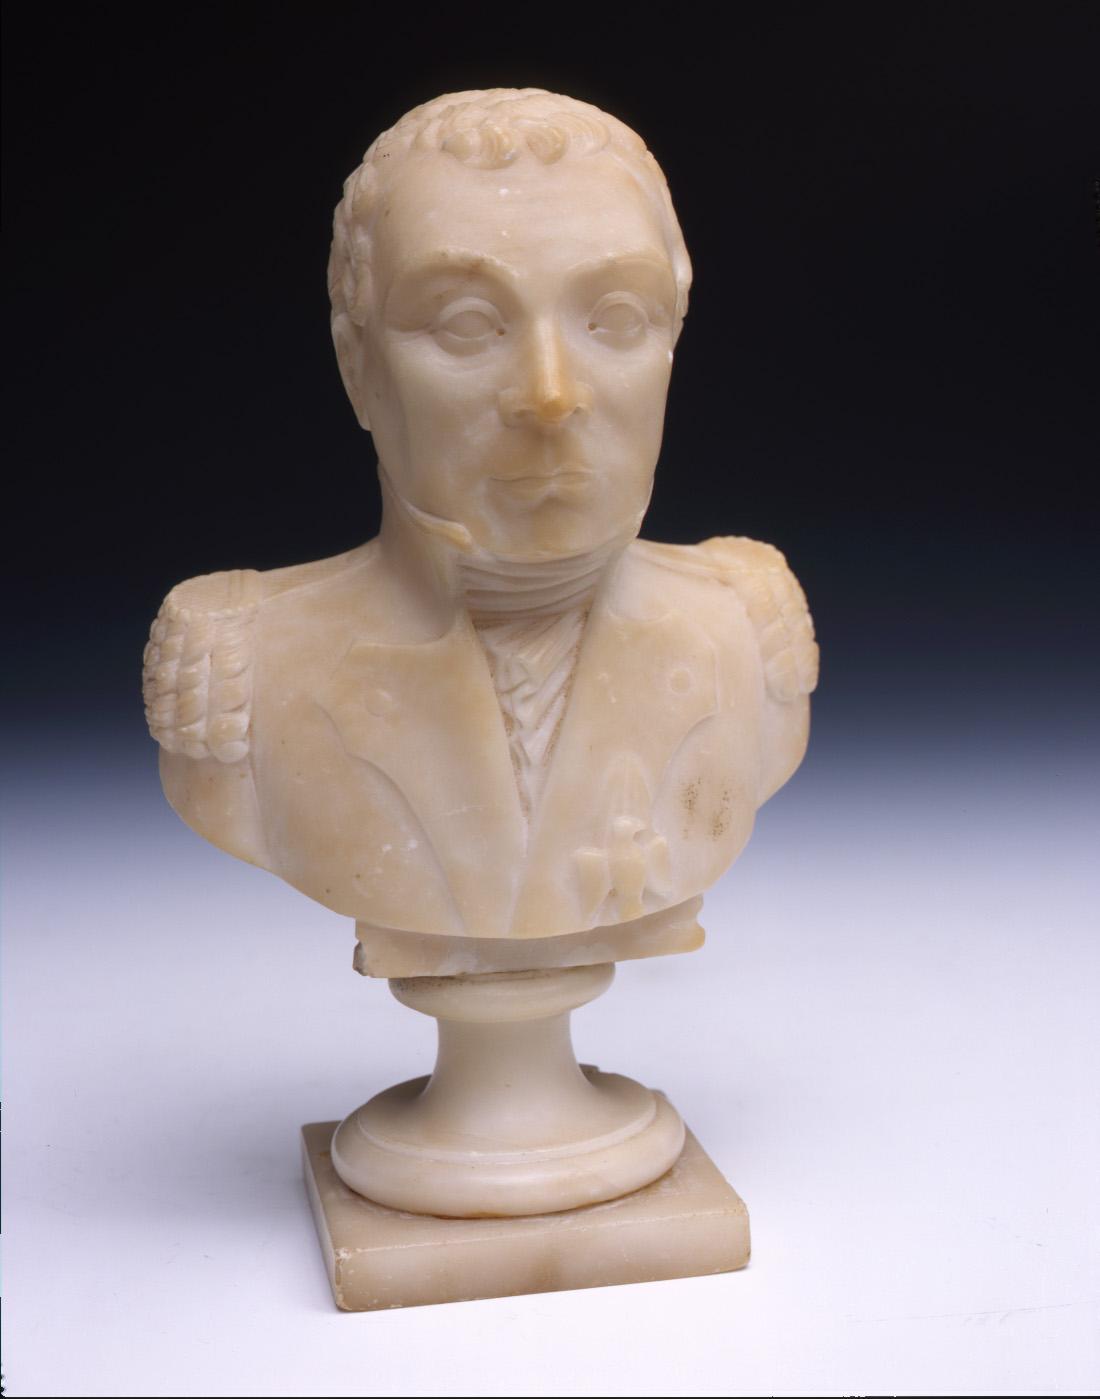 Marquis de Lafayette, ca. 1825-1830